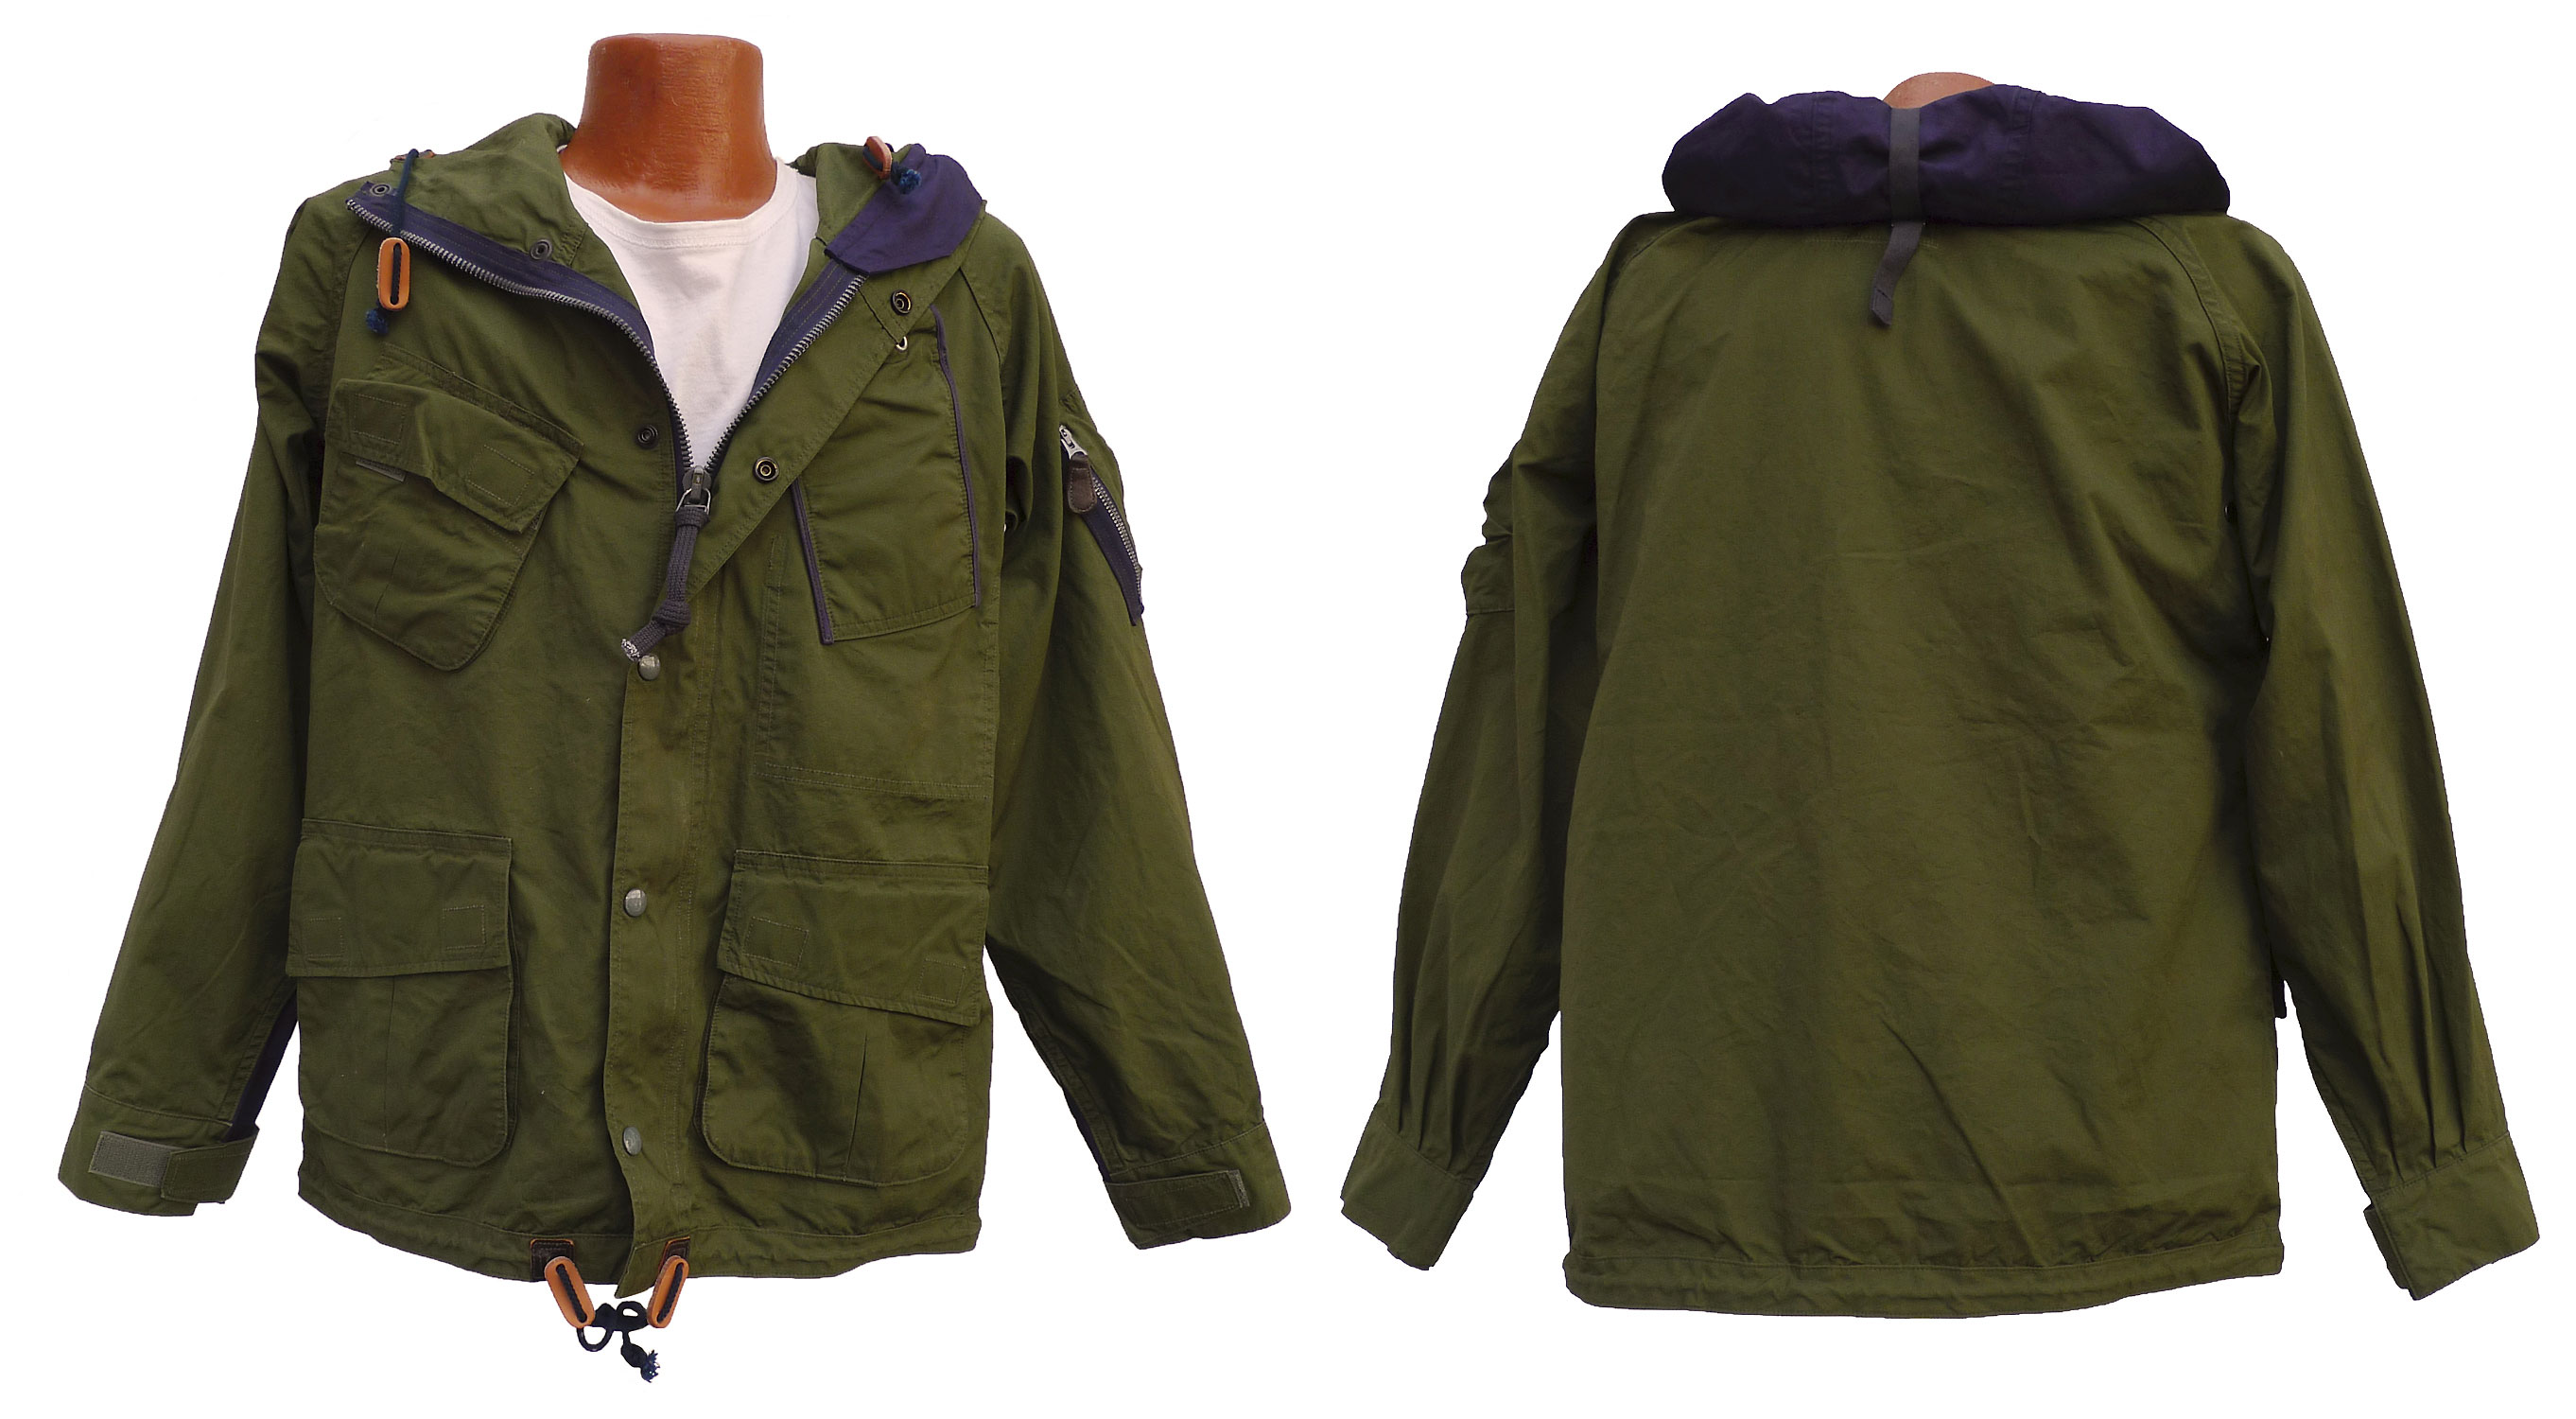 Sea Captain Jacket For Men Bing Images